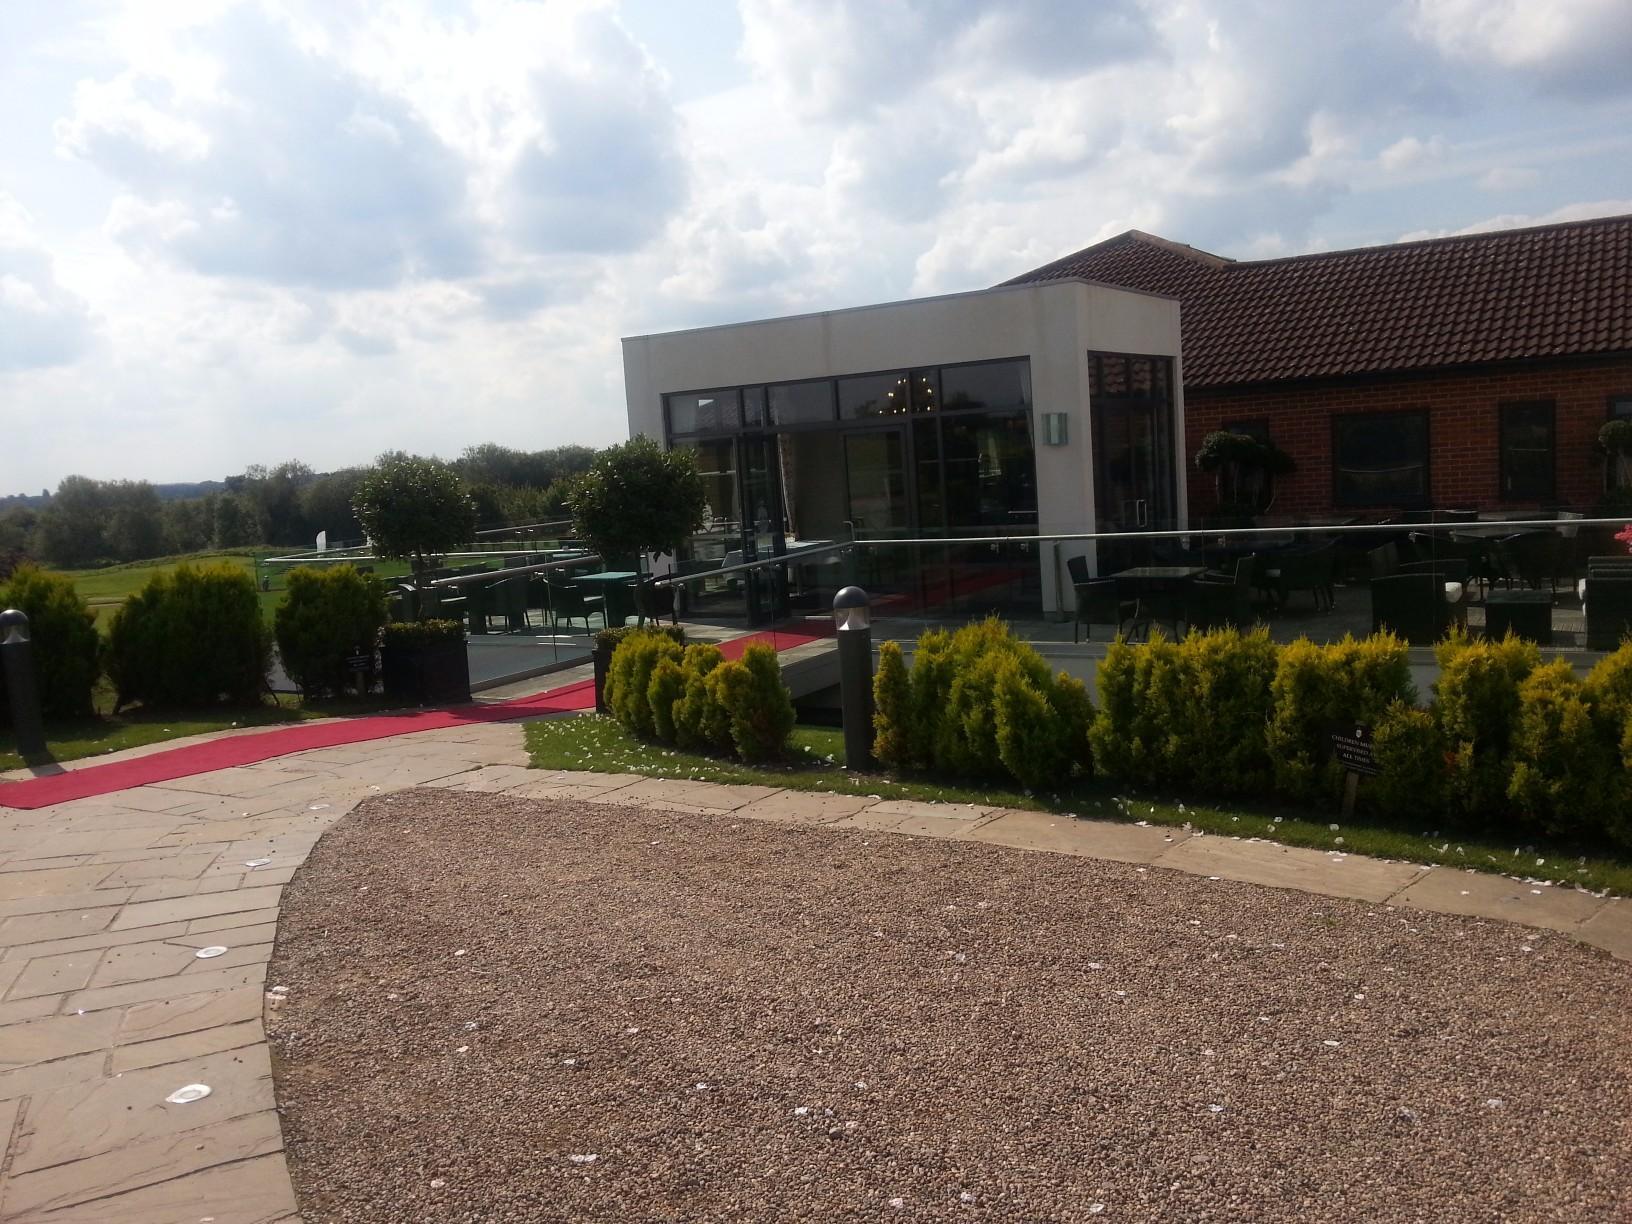 Nottinghamshire Golf Country Club Steelasophical SteelBand Dj Weddings